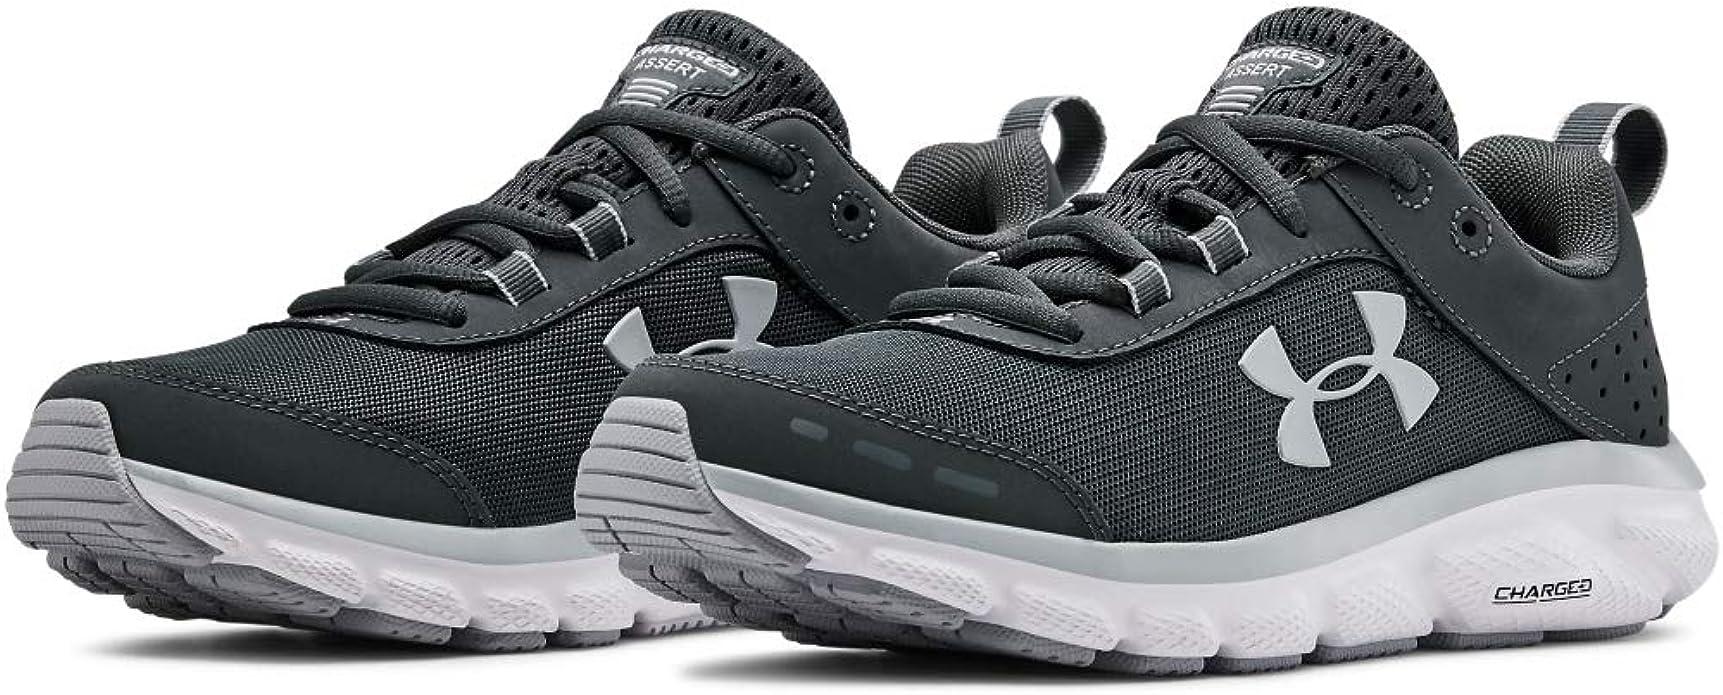 Under Armour 安德玛 UA Charged Assert 8 女子跑步运动鞋 35.5码1.8折$16 海淘转运到手约¥213